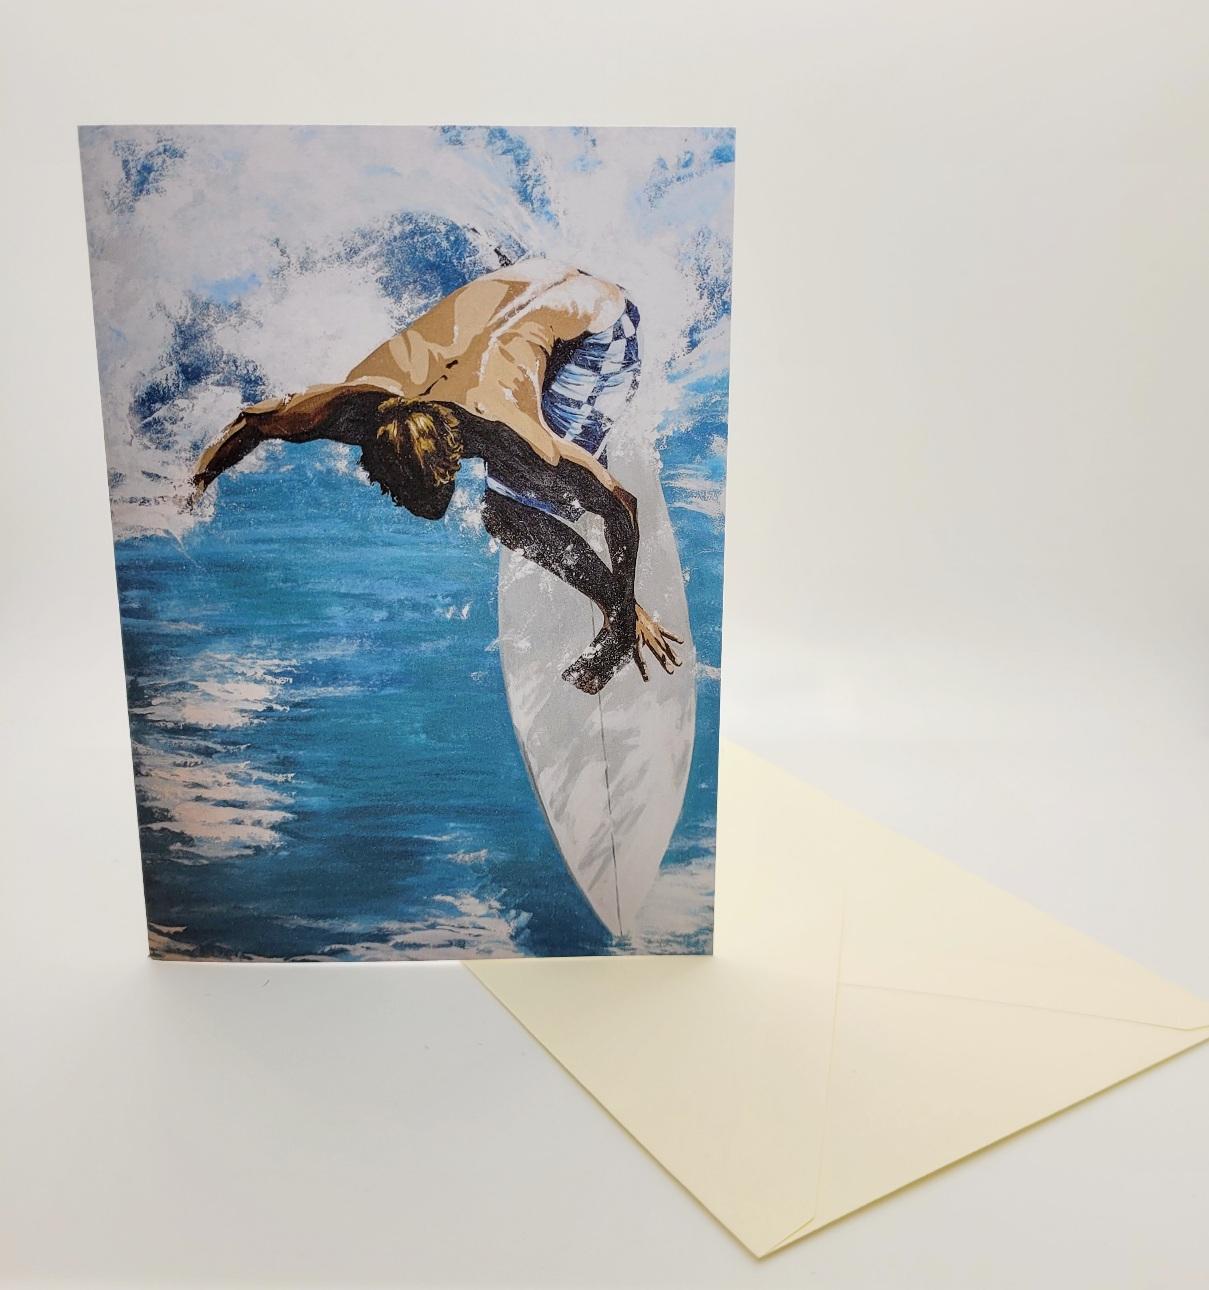 Greetings card. Surfer